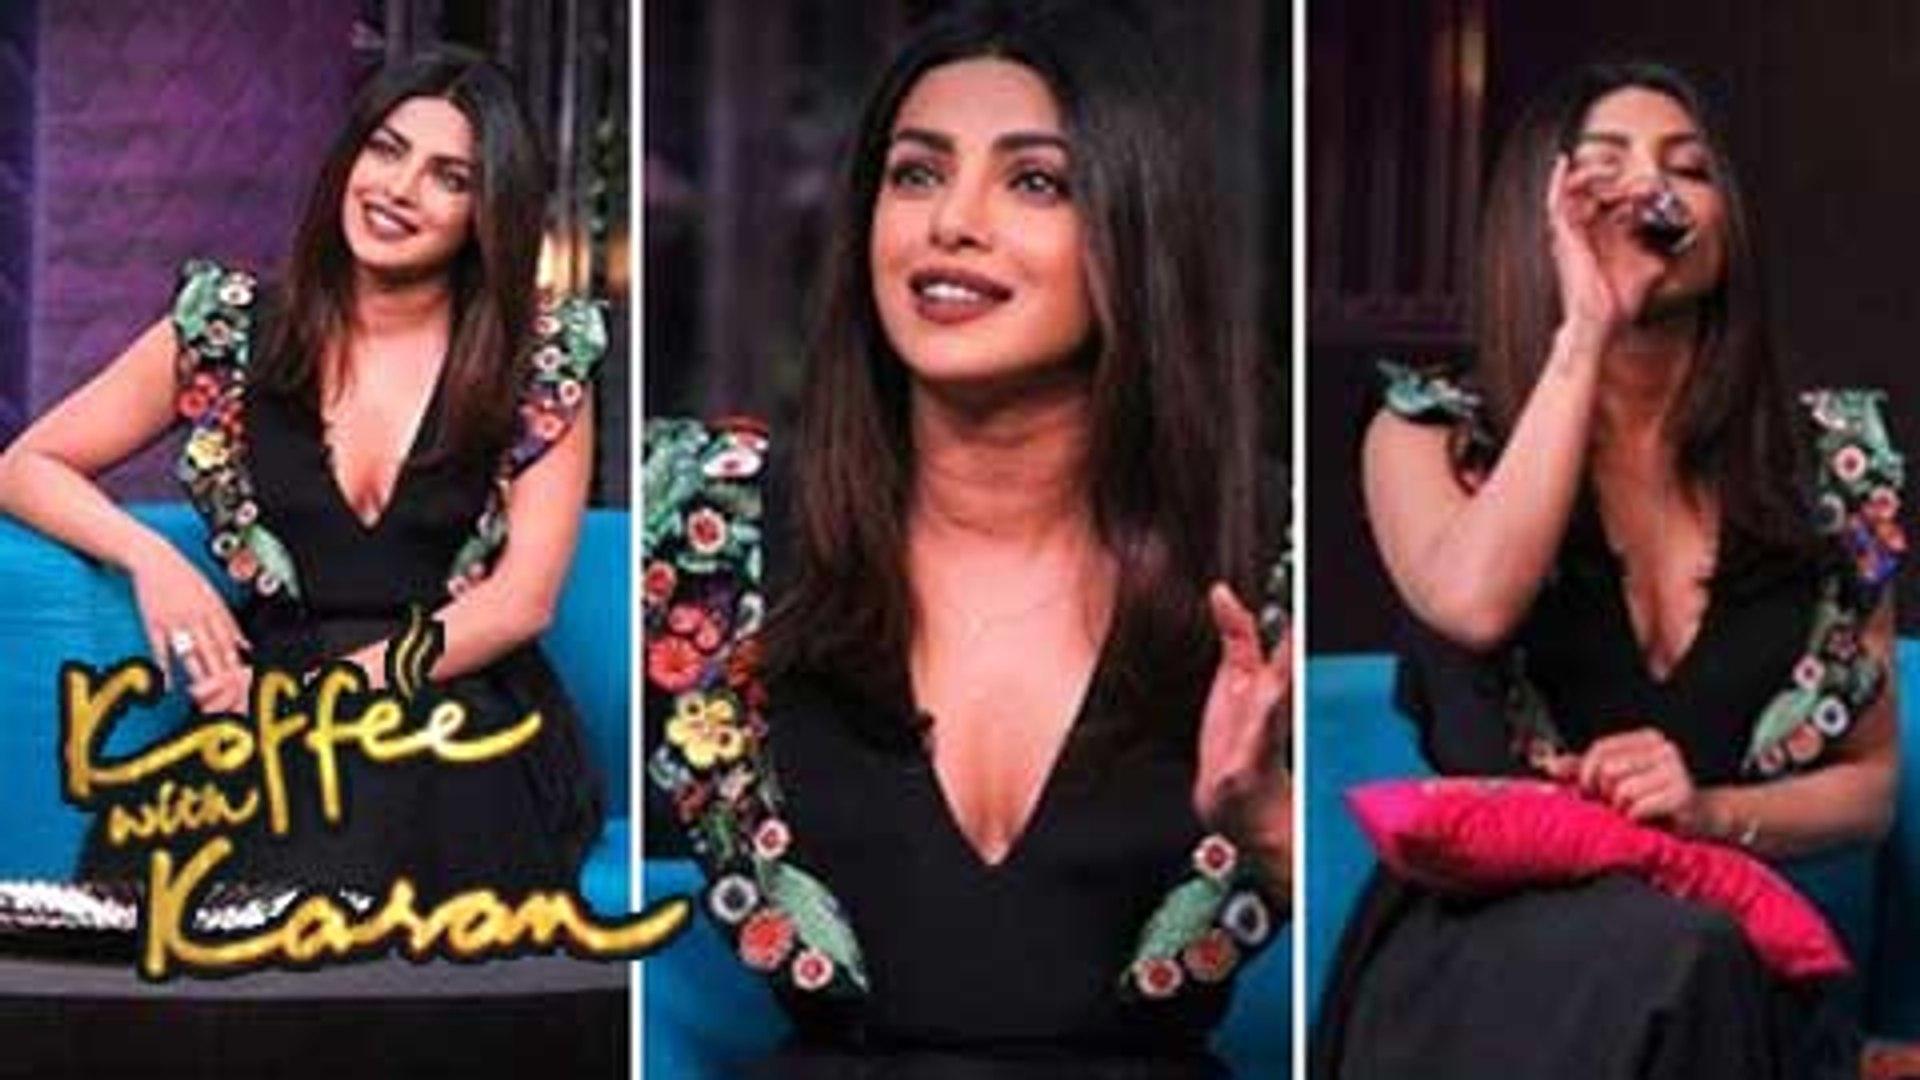 Priyanka Chopra On Koffee With Karan Season 5 Episode 12 BEST MOMENTS